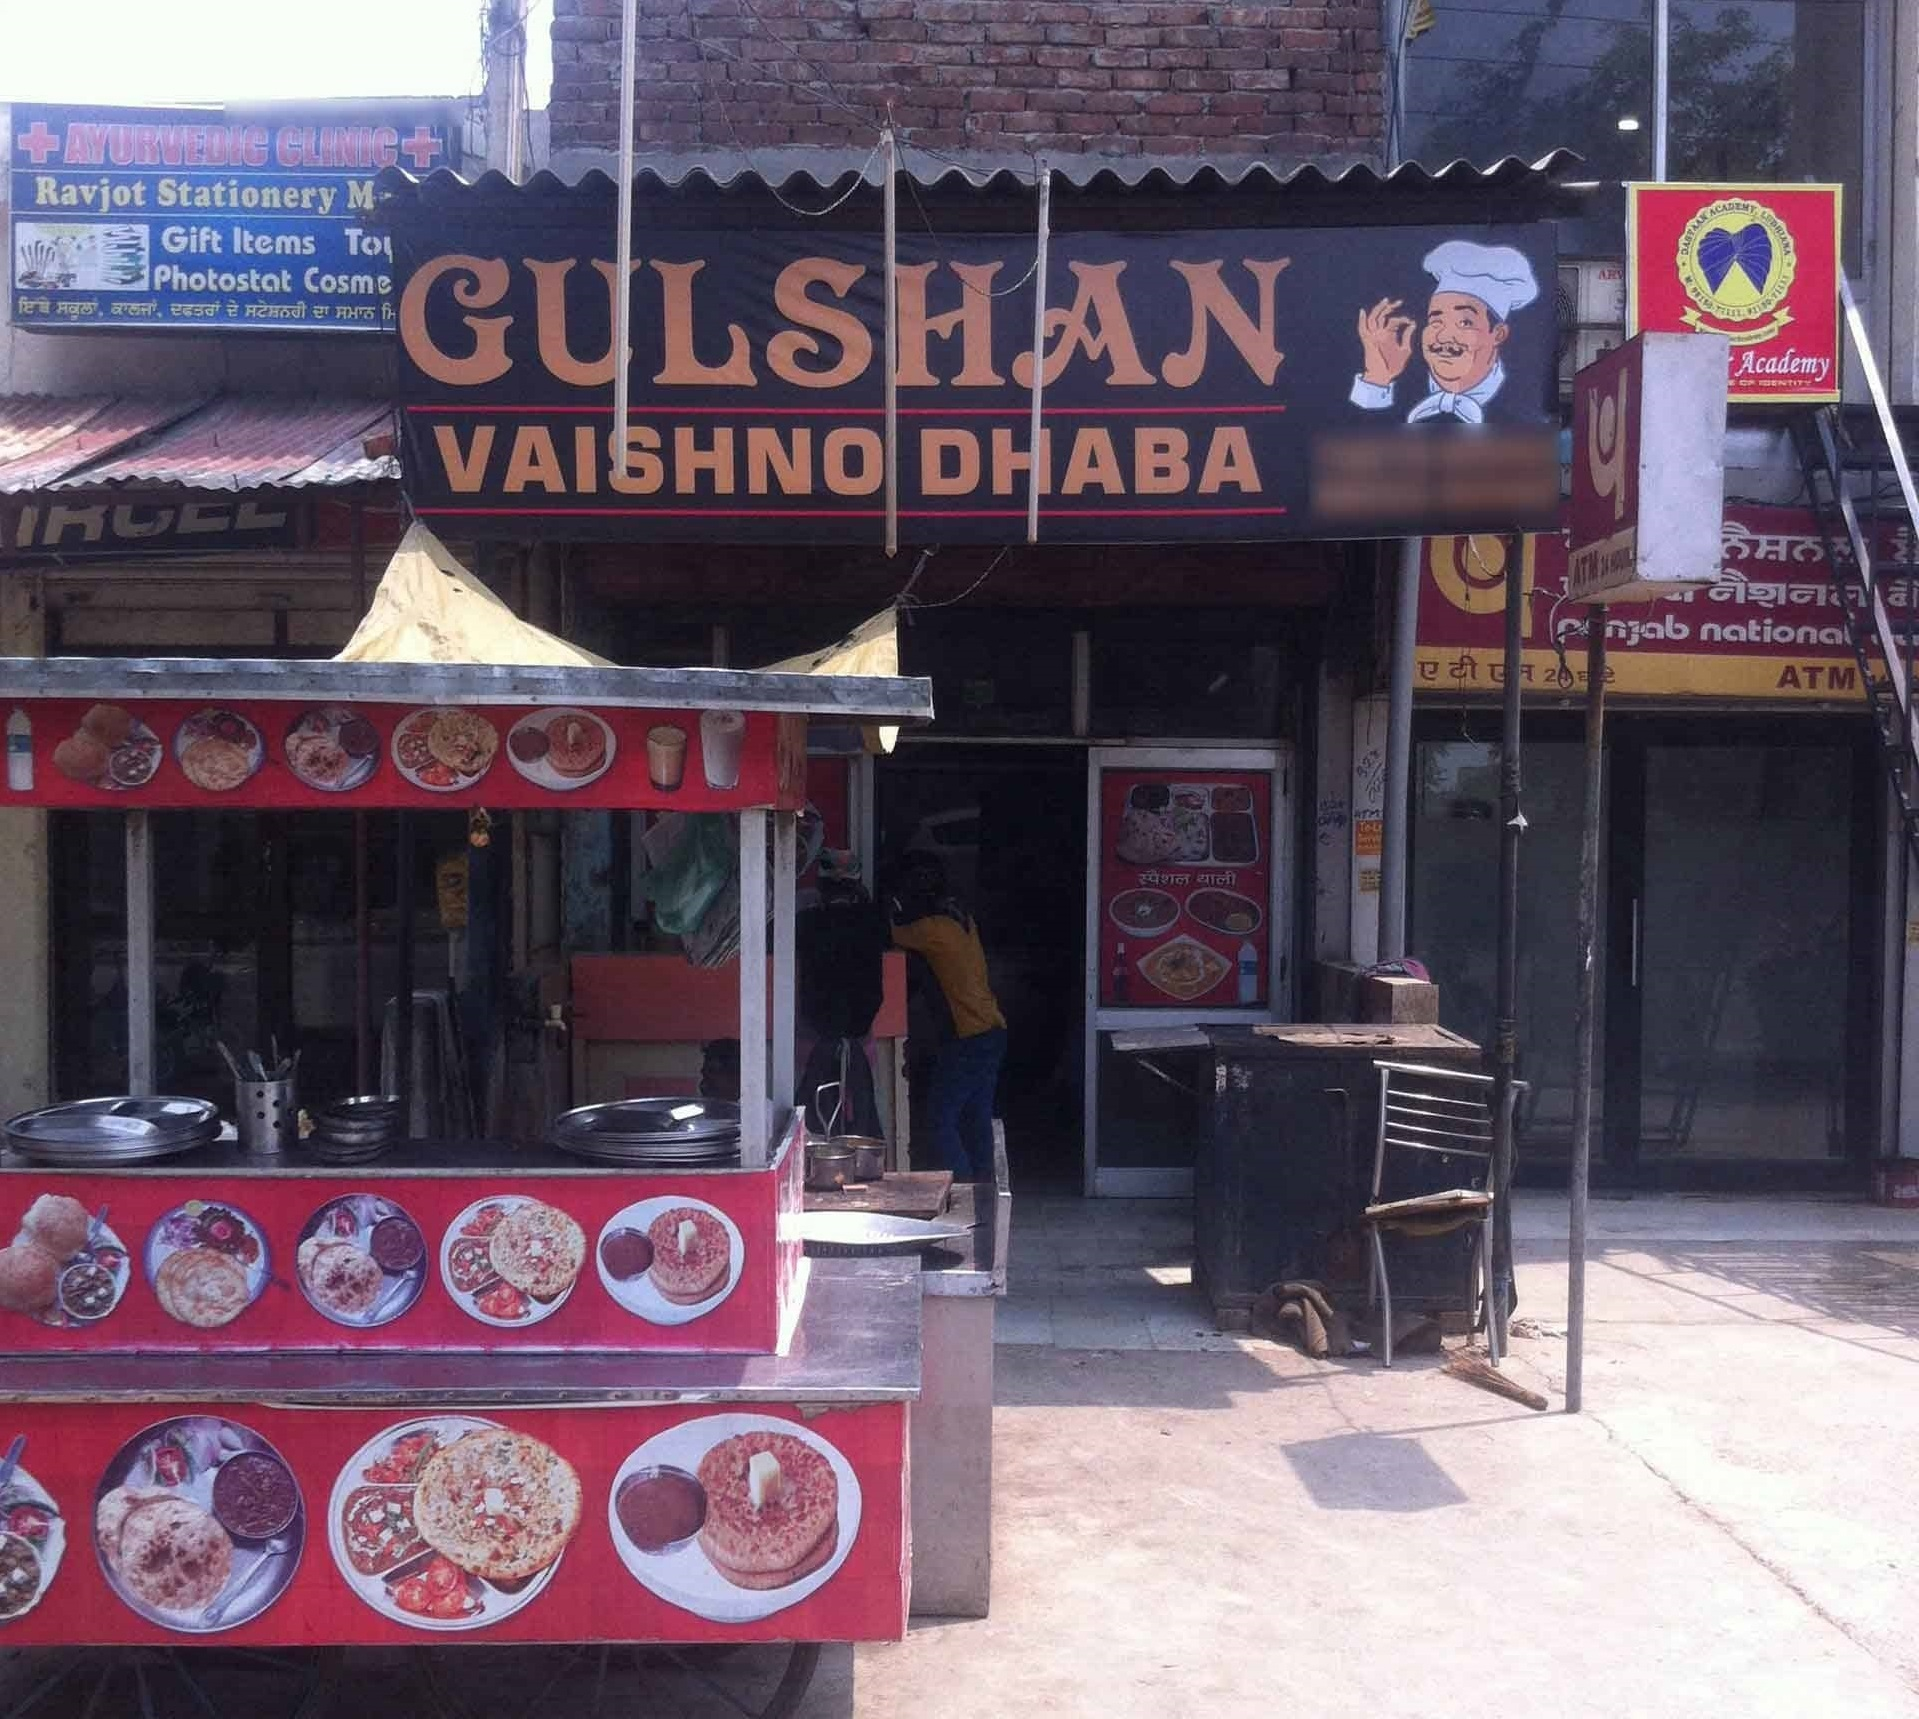 Gulshan Non Veg Dhaba - Dugri - Ludhiana Image